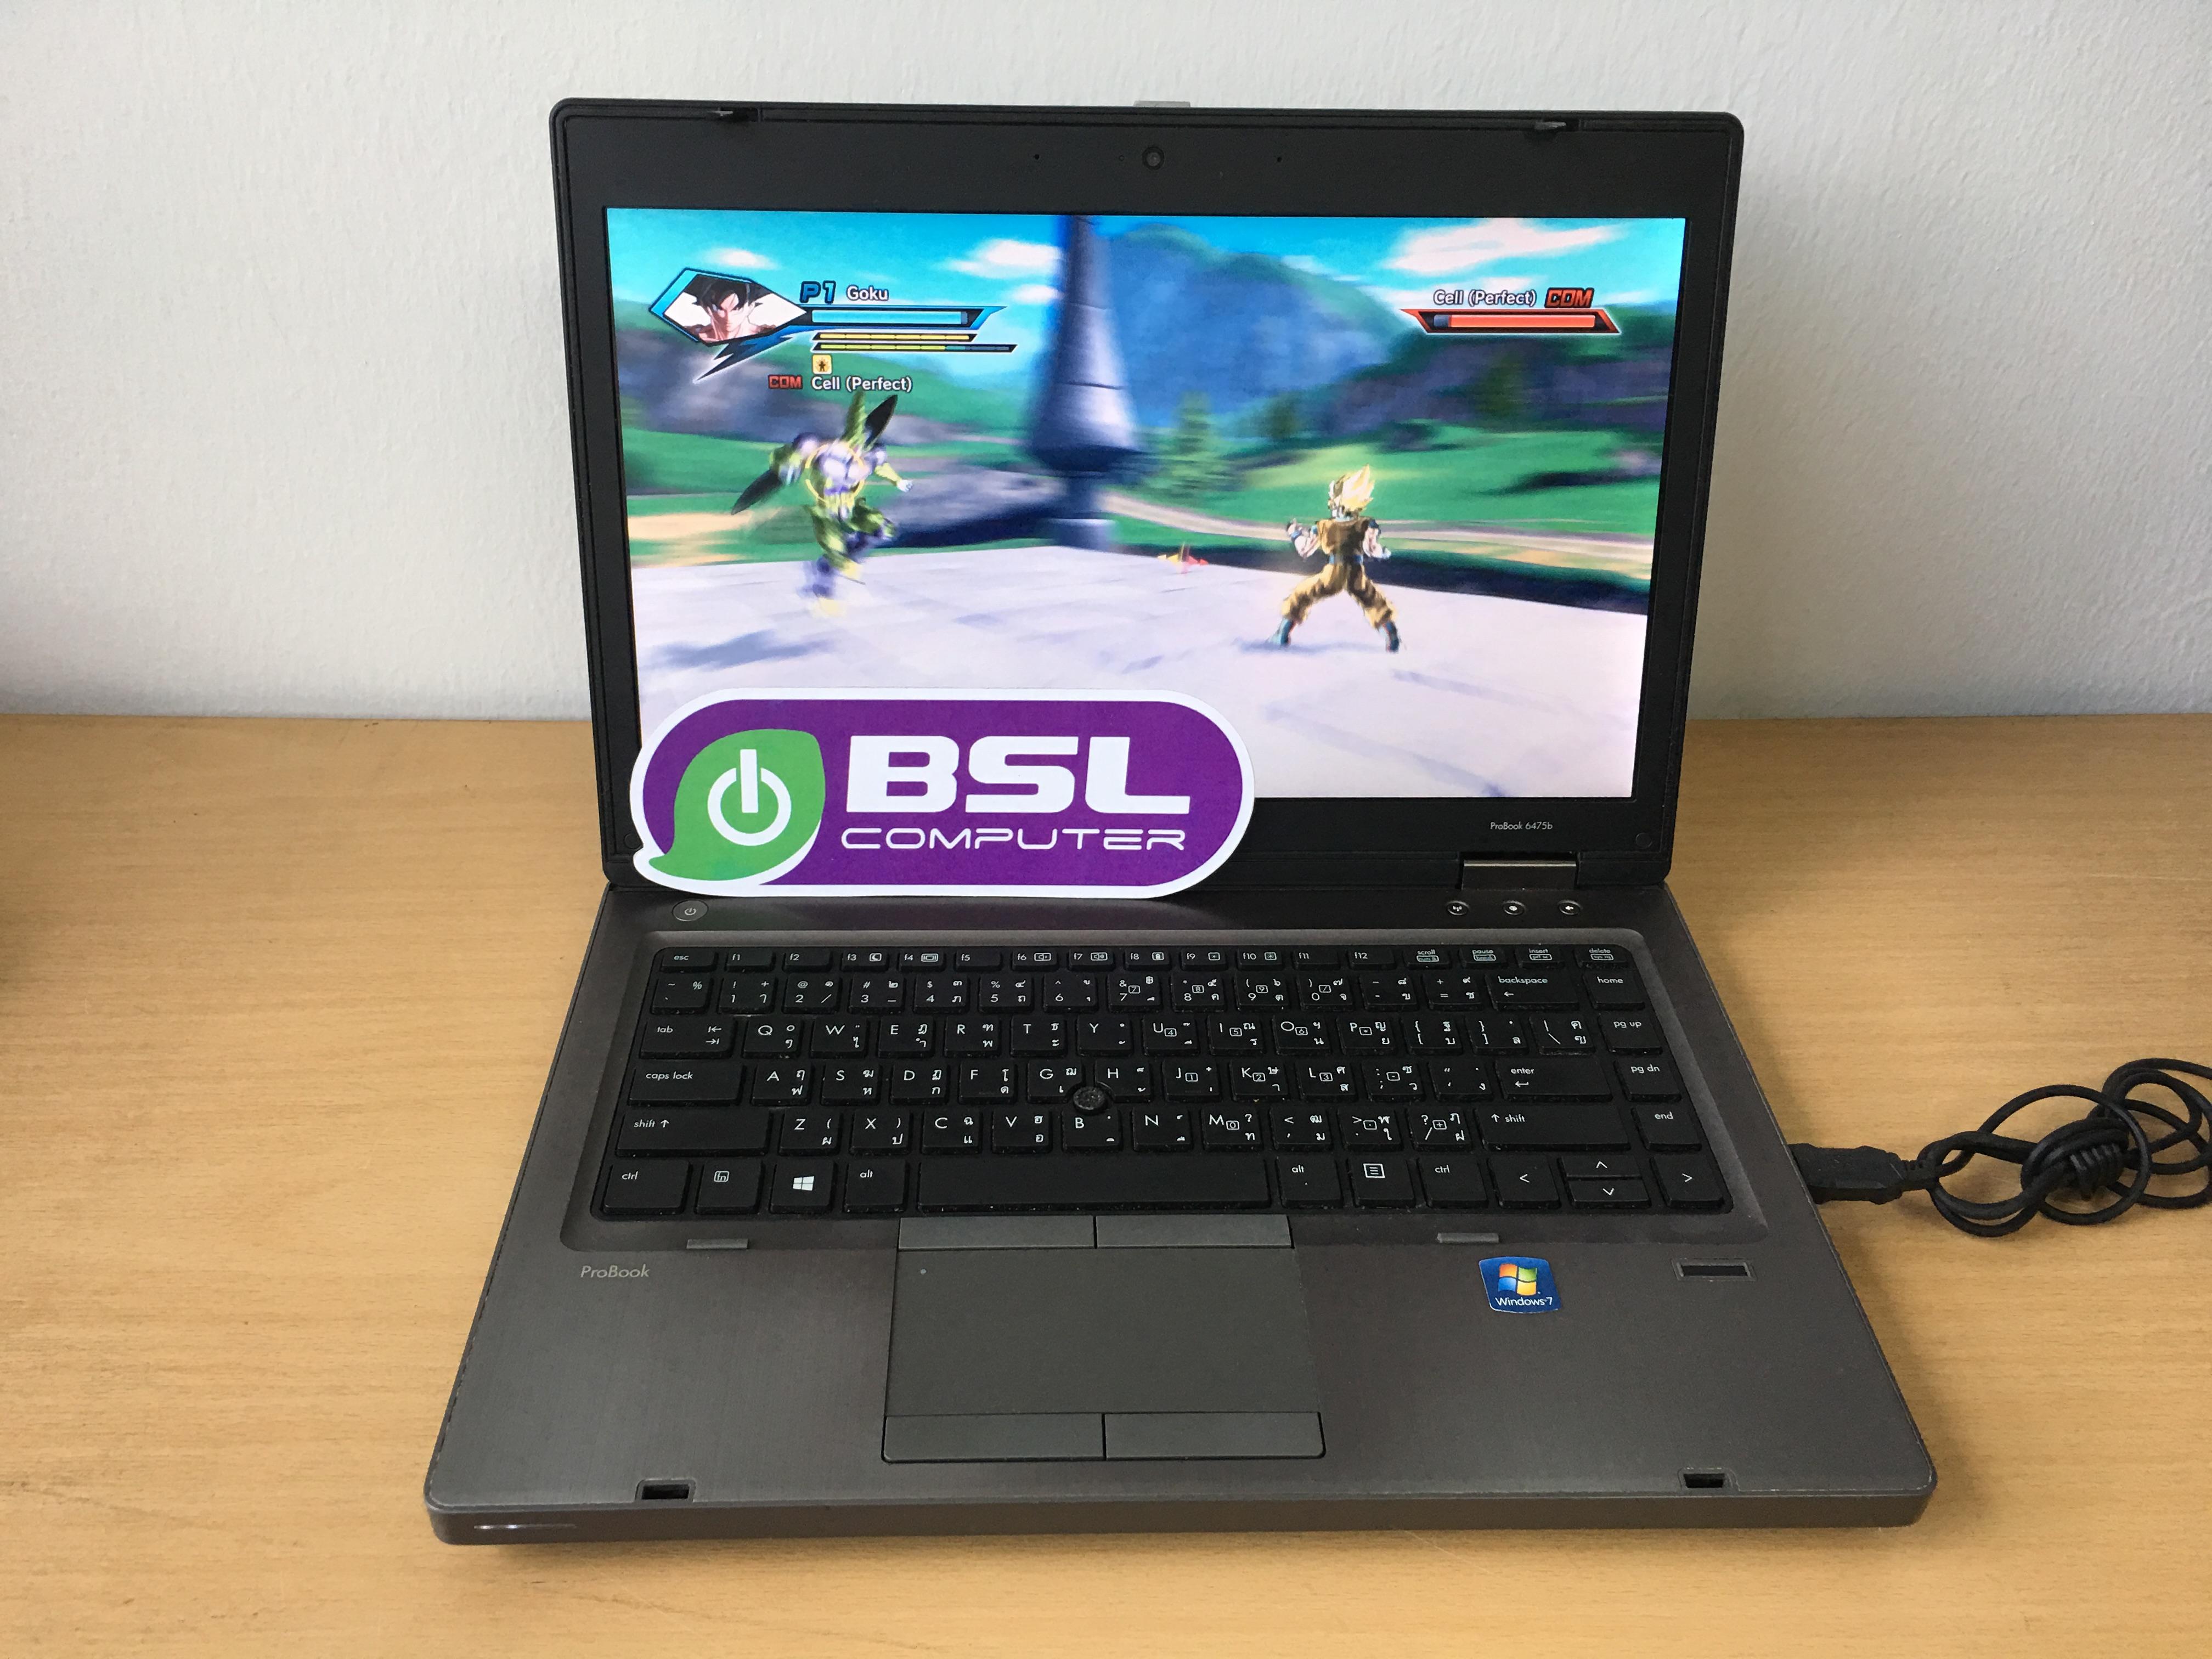 Notebook HP การ์จอแยก เล่นเกมส์มัน Probook 6475b